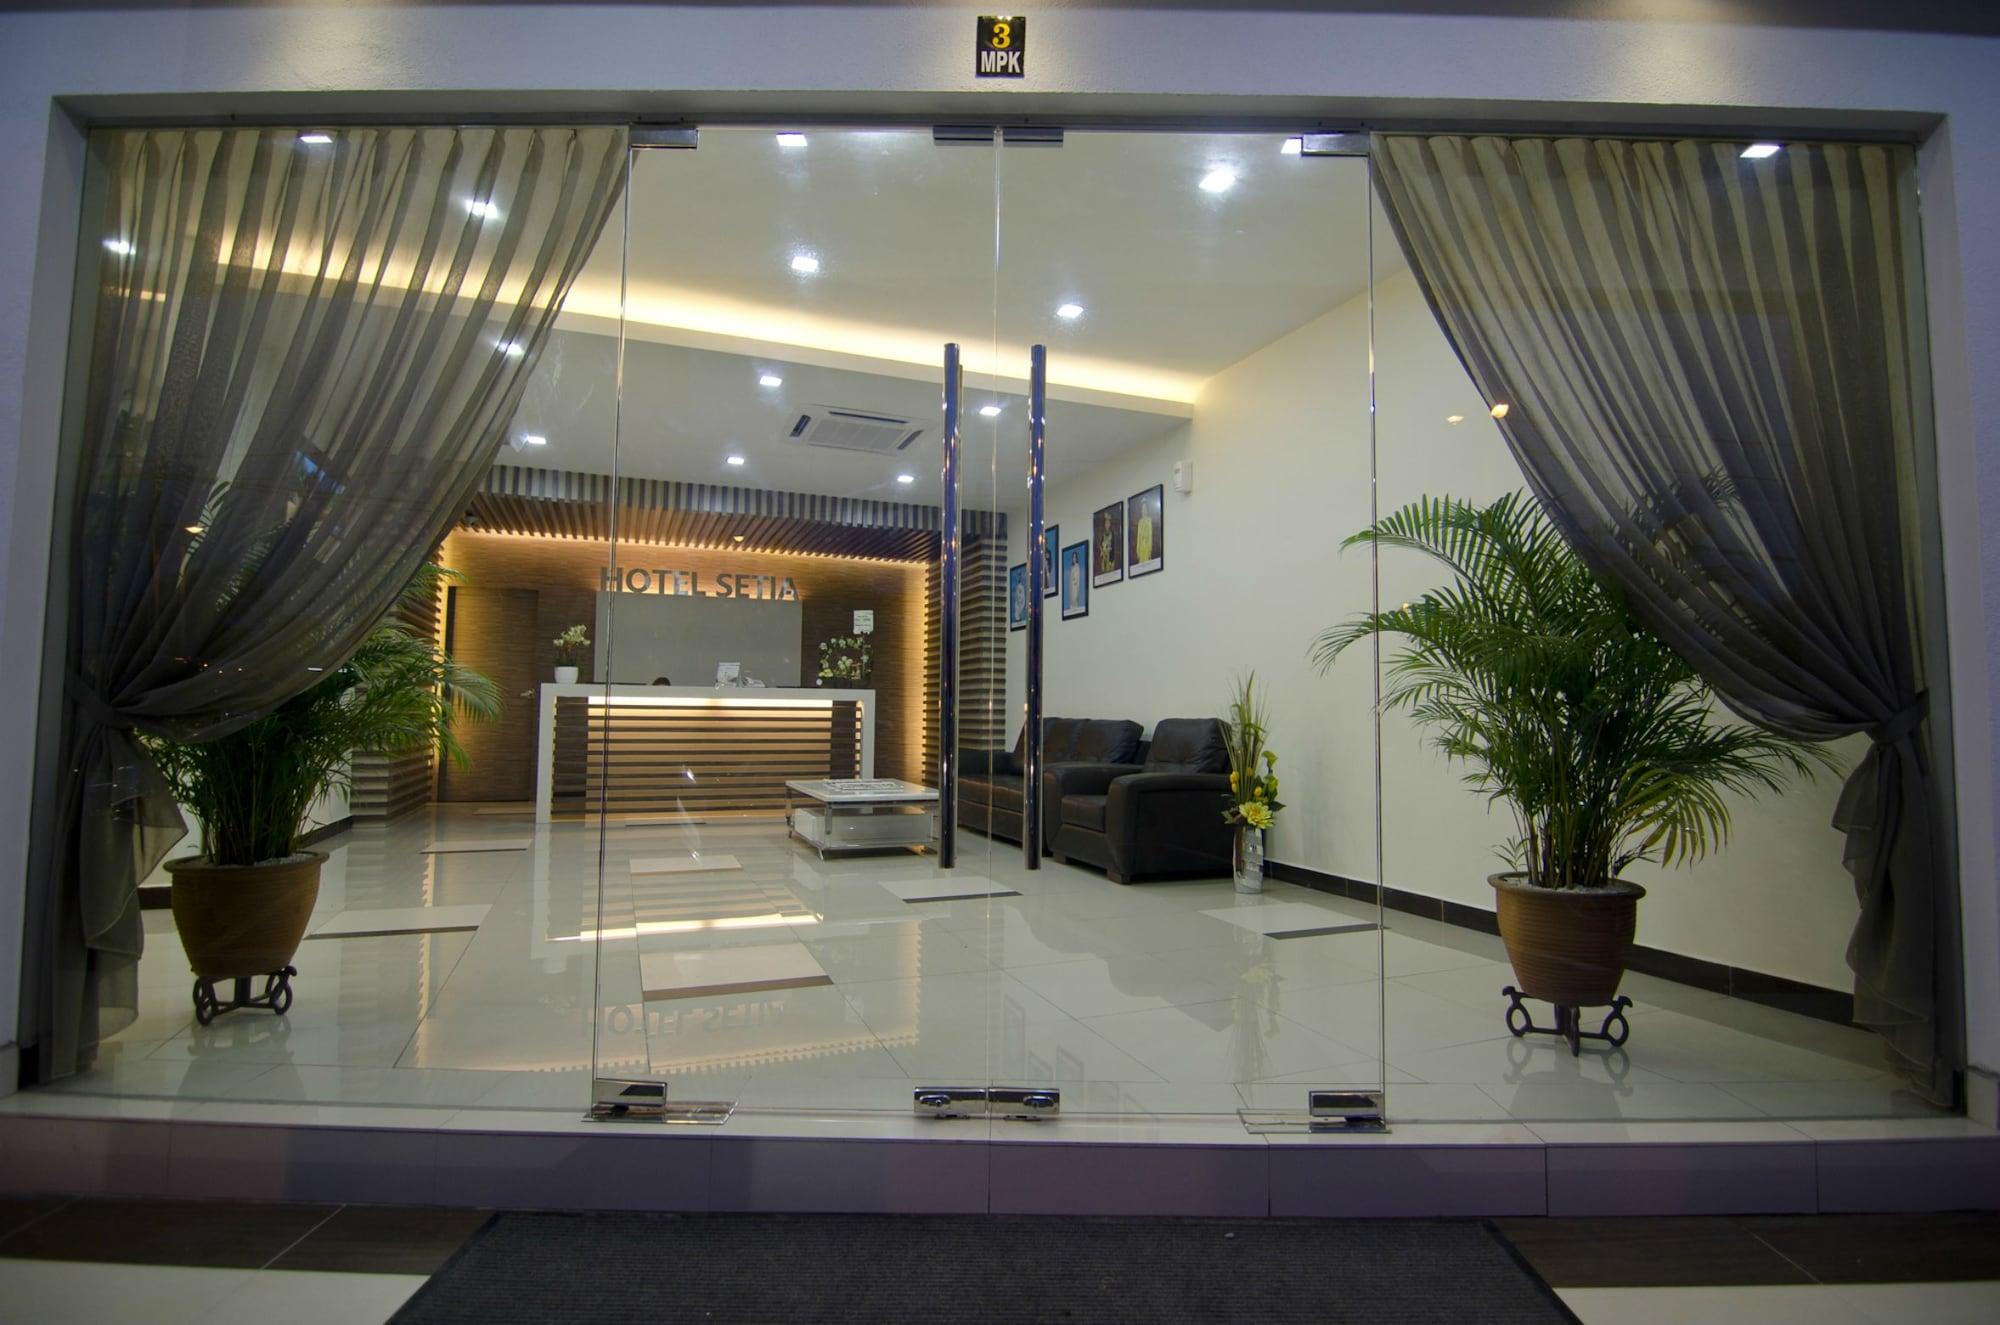 Hotel Setia, Keluang